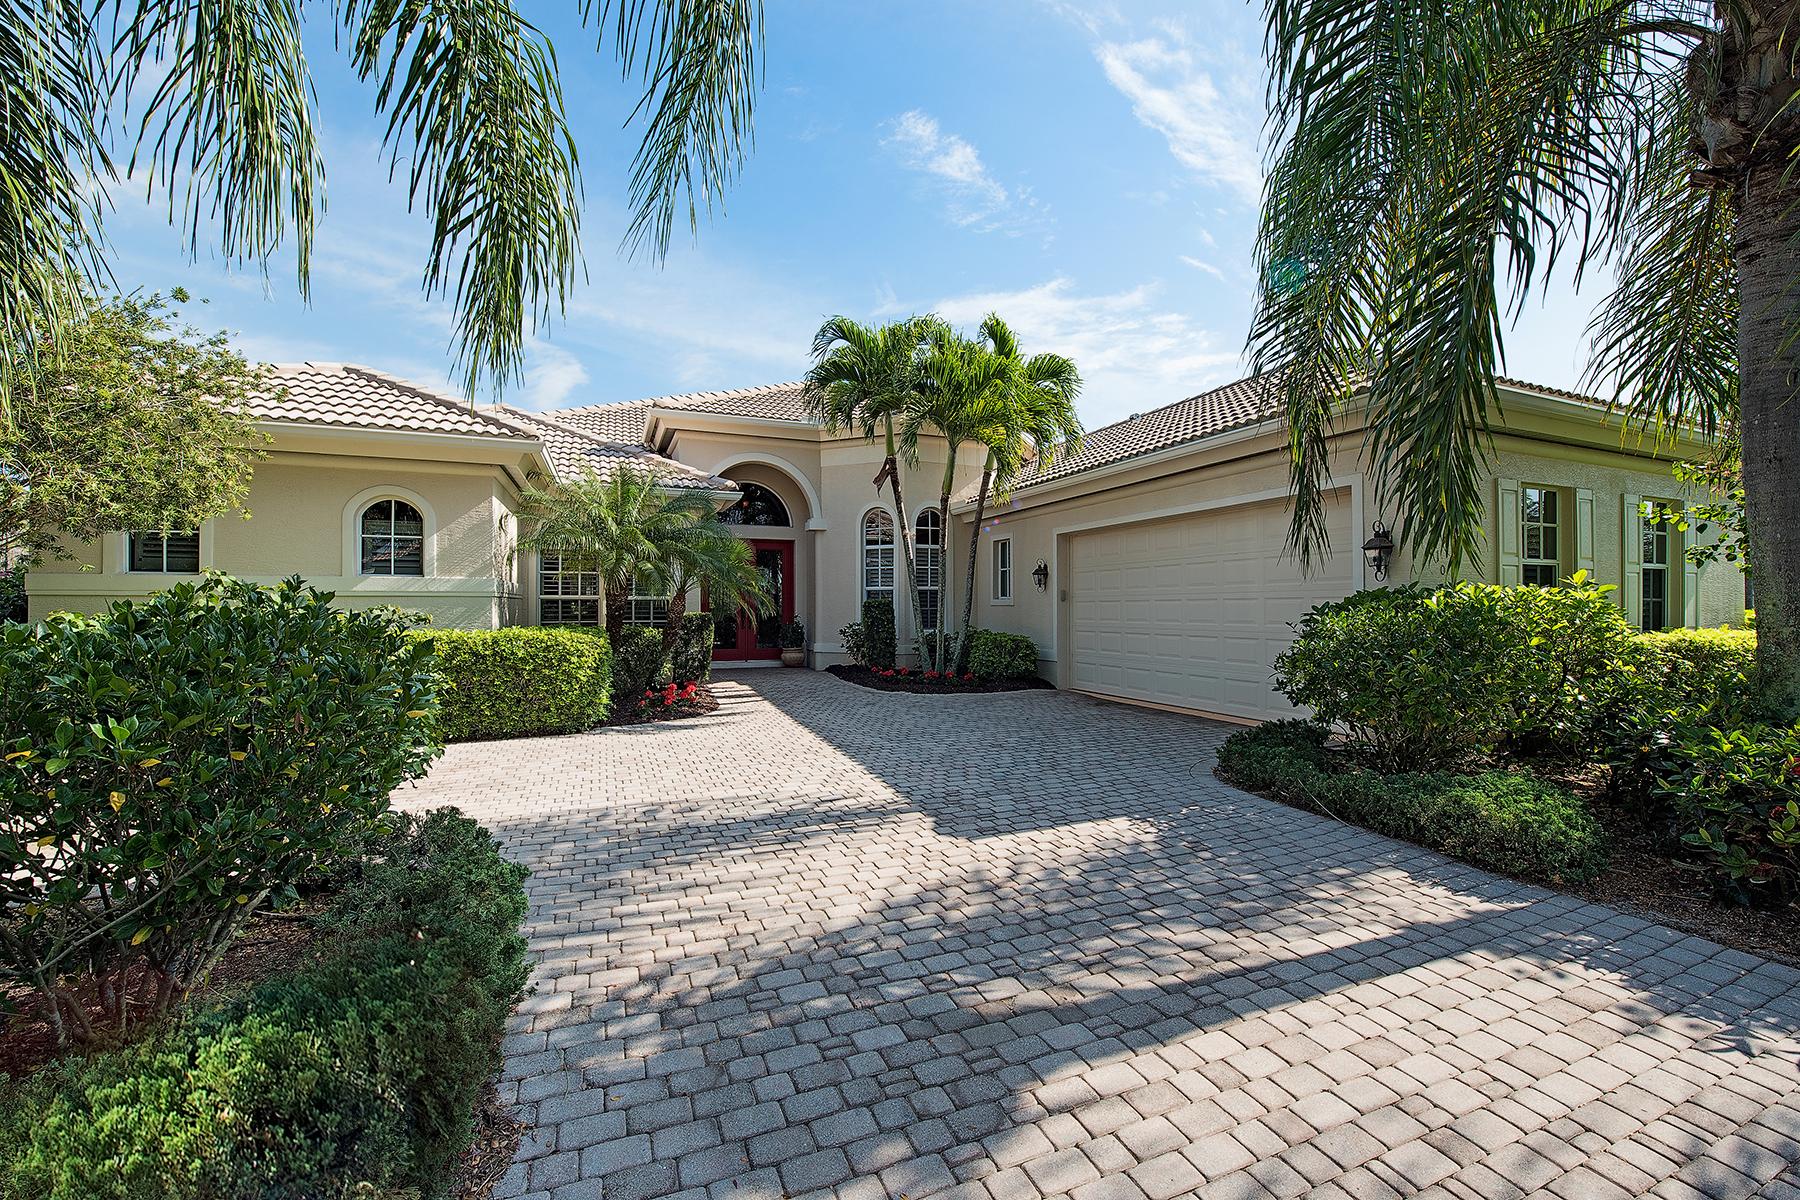 Single Family Home for Sale at CEDAR GLEN 9110 Hollow Pine Dr Estero, Florida 34135 United States